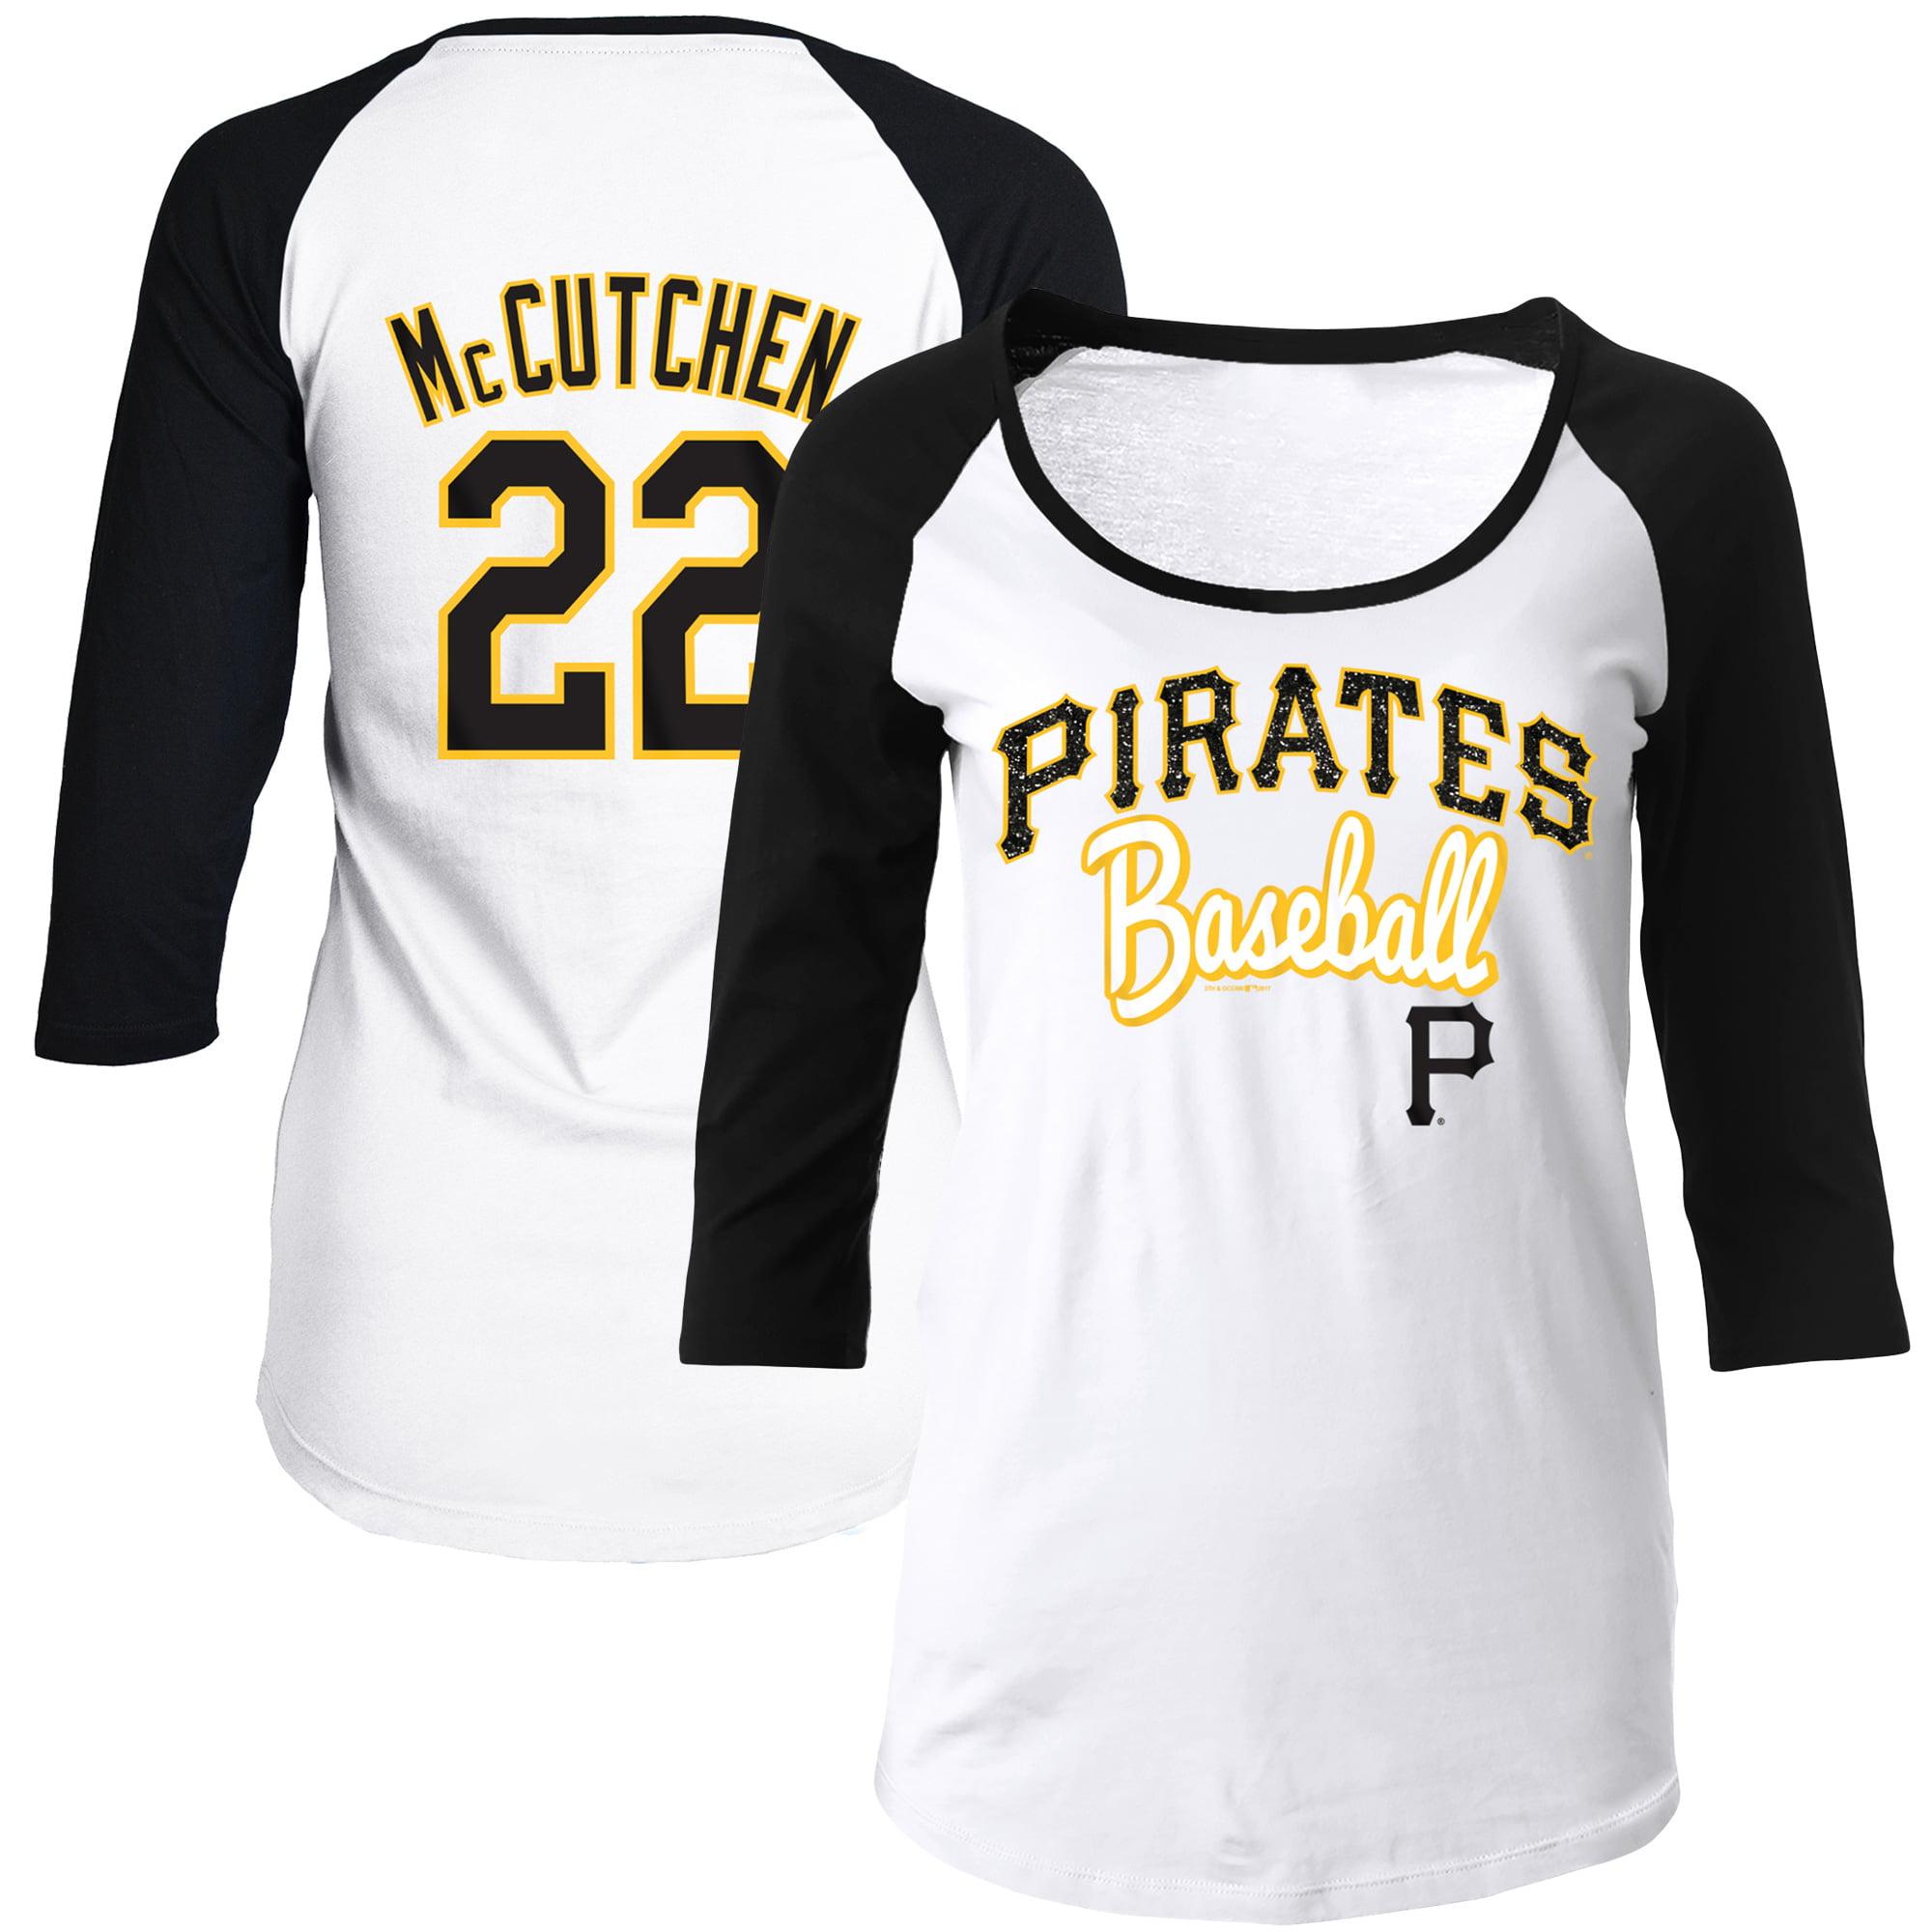 Andrew McCutchen Pittsburgh Pirates 5th & Ocean by New Era Women's Glitter 3/4-Sleeve Raglan T-Shirt - White/Black